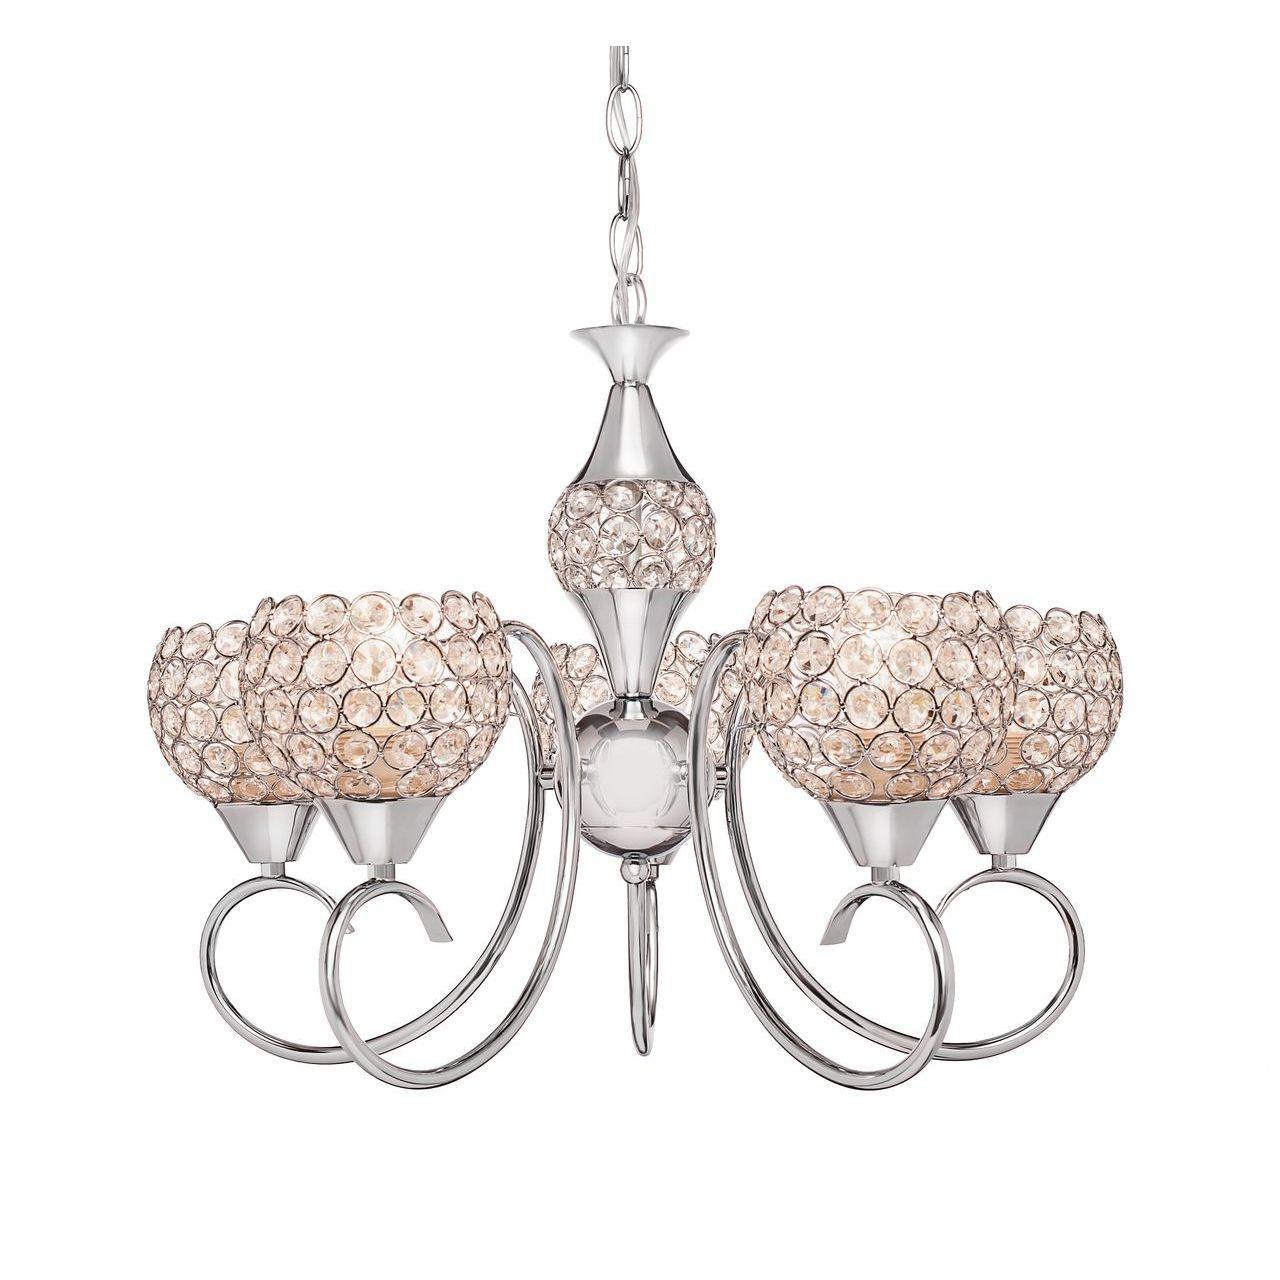 Люстра Silver Light Malika 126.54.5 подвесная подвесная люстра silver light malika 126 54 5